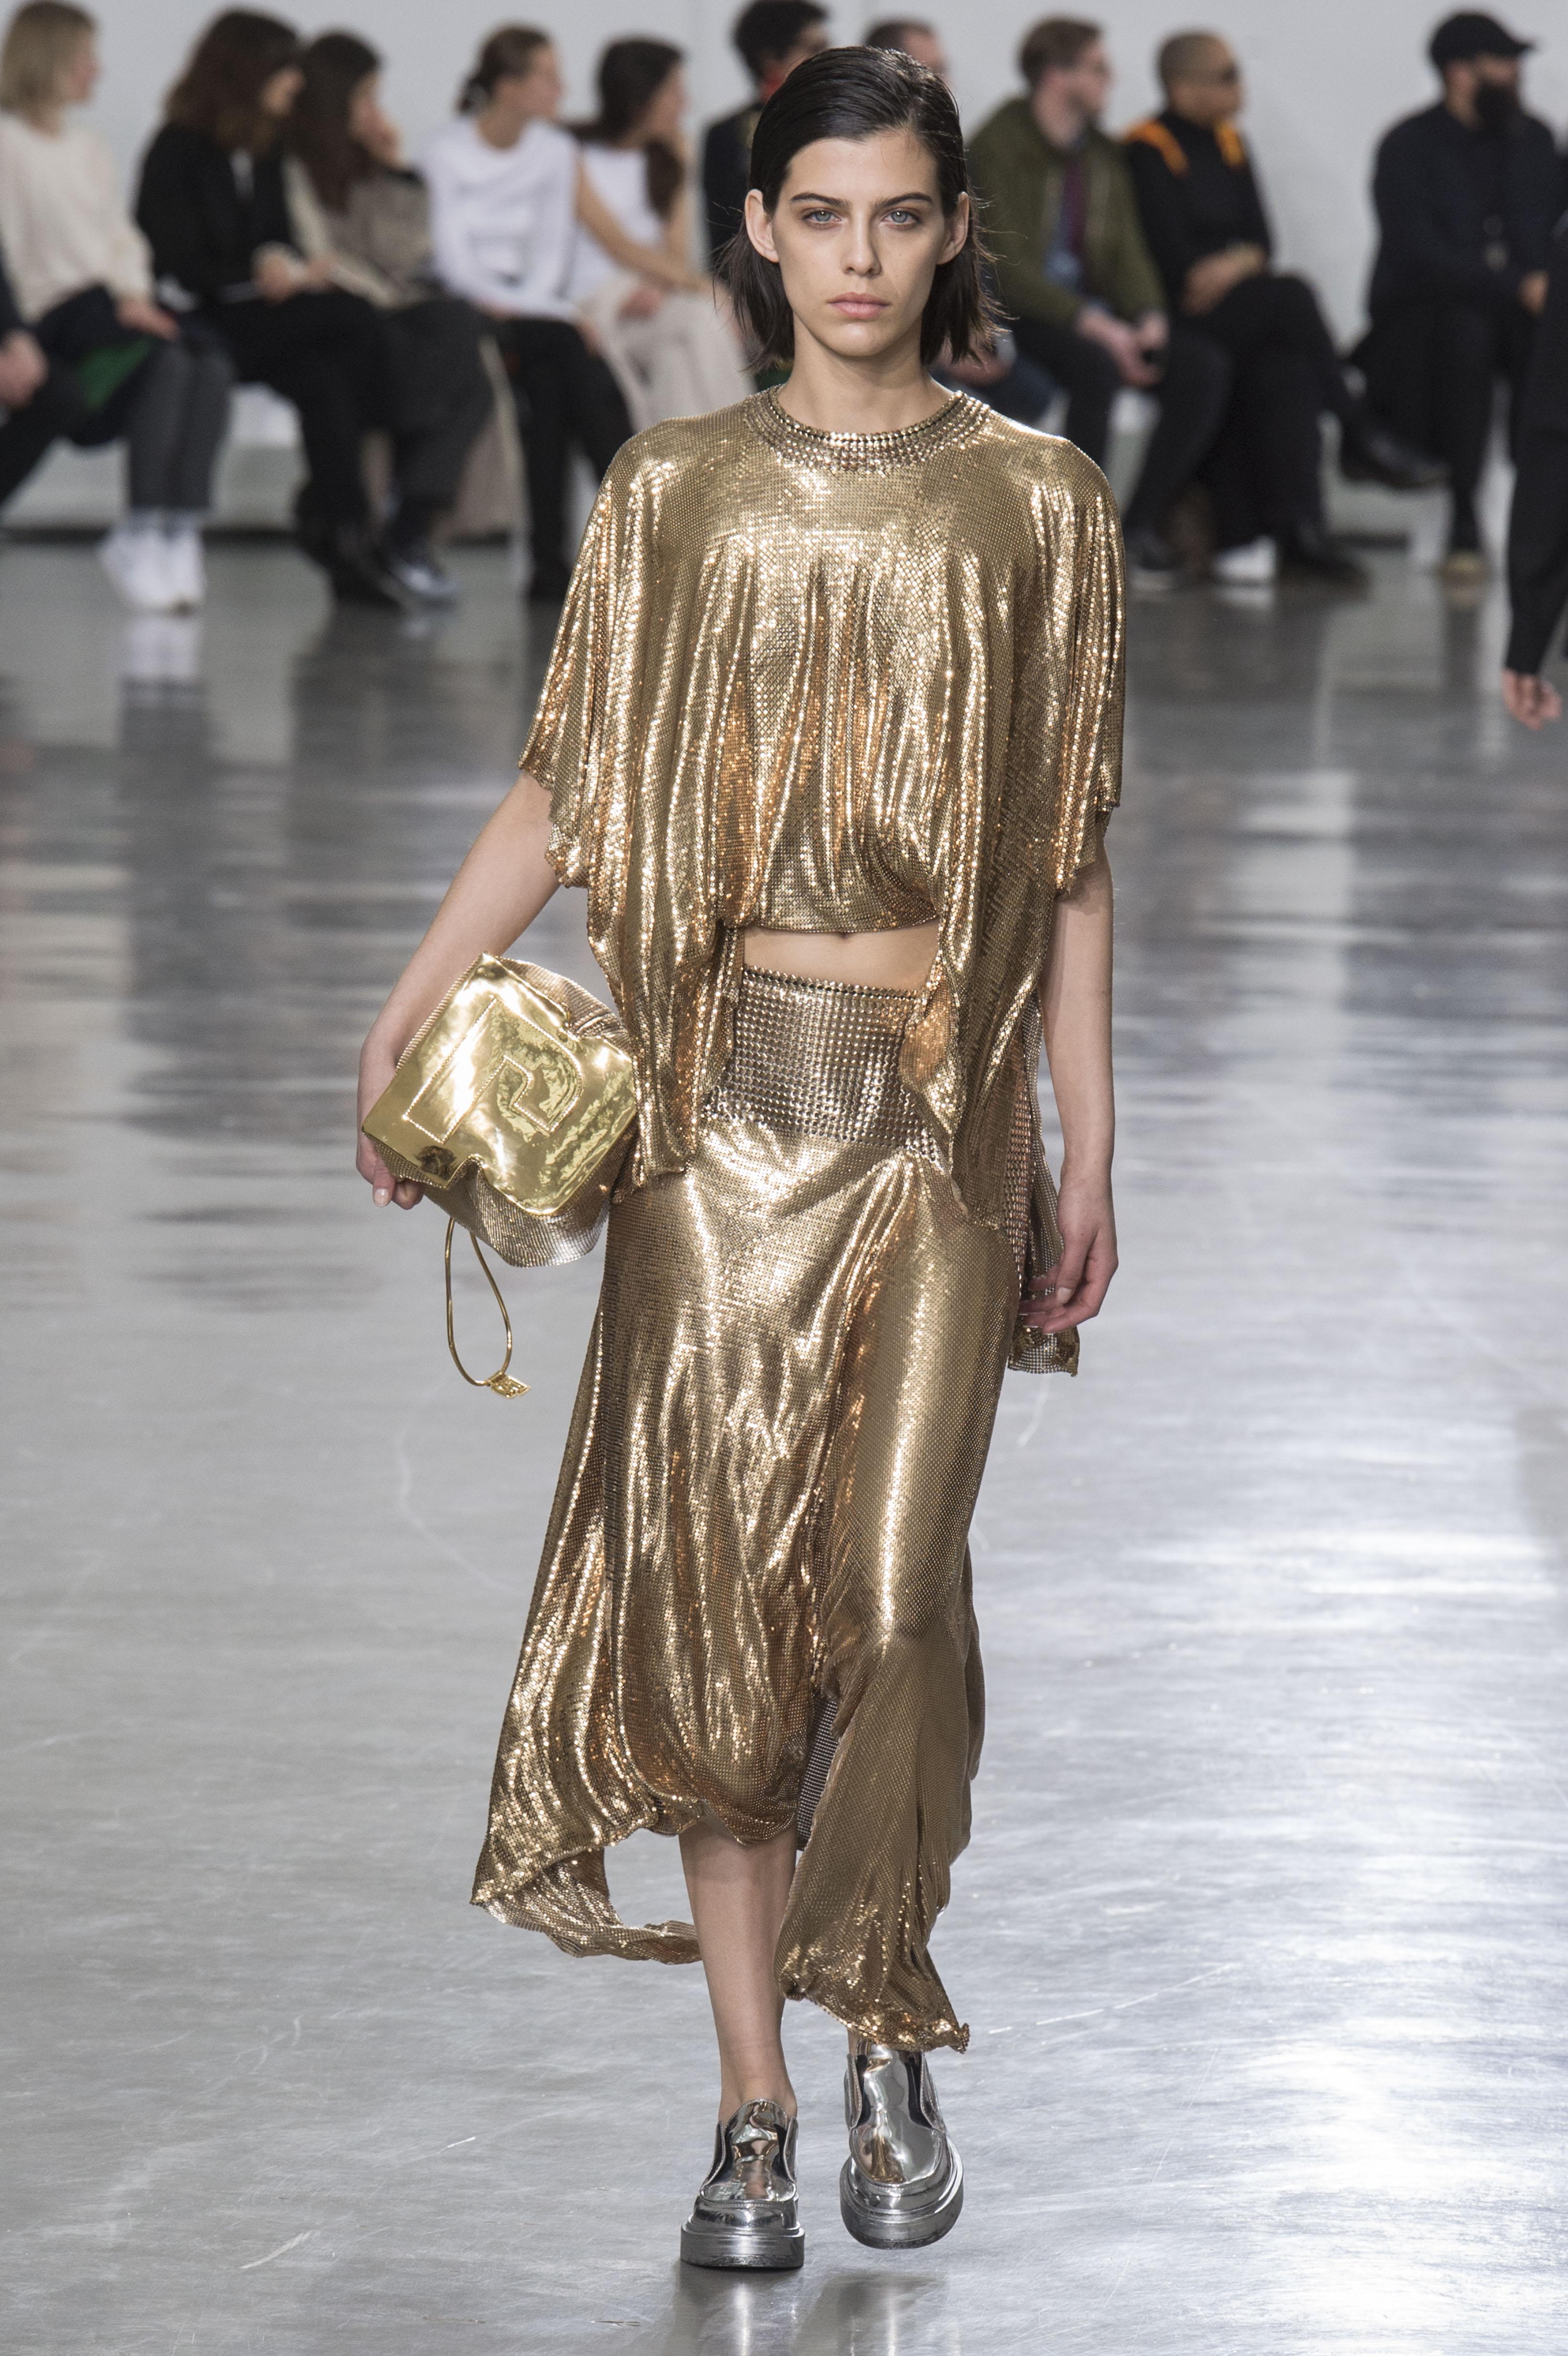 Paco Rabanne Womenswear, Paris winter 2017 2018